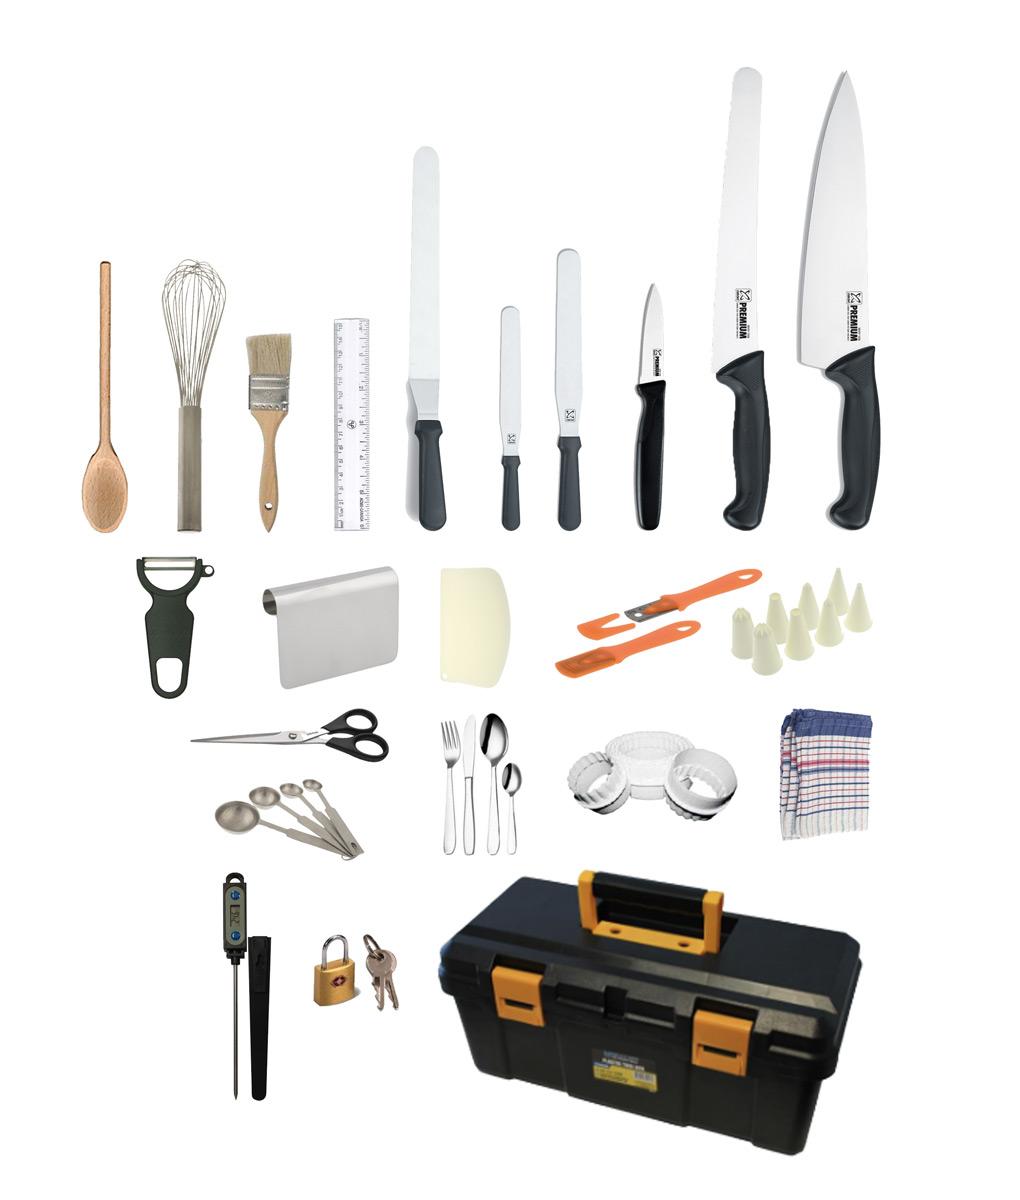 25 Piece Patisserie Chef Starter Kit By Club Chef Club